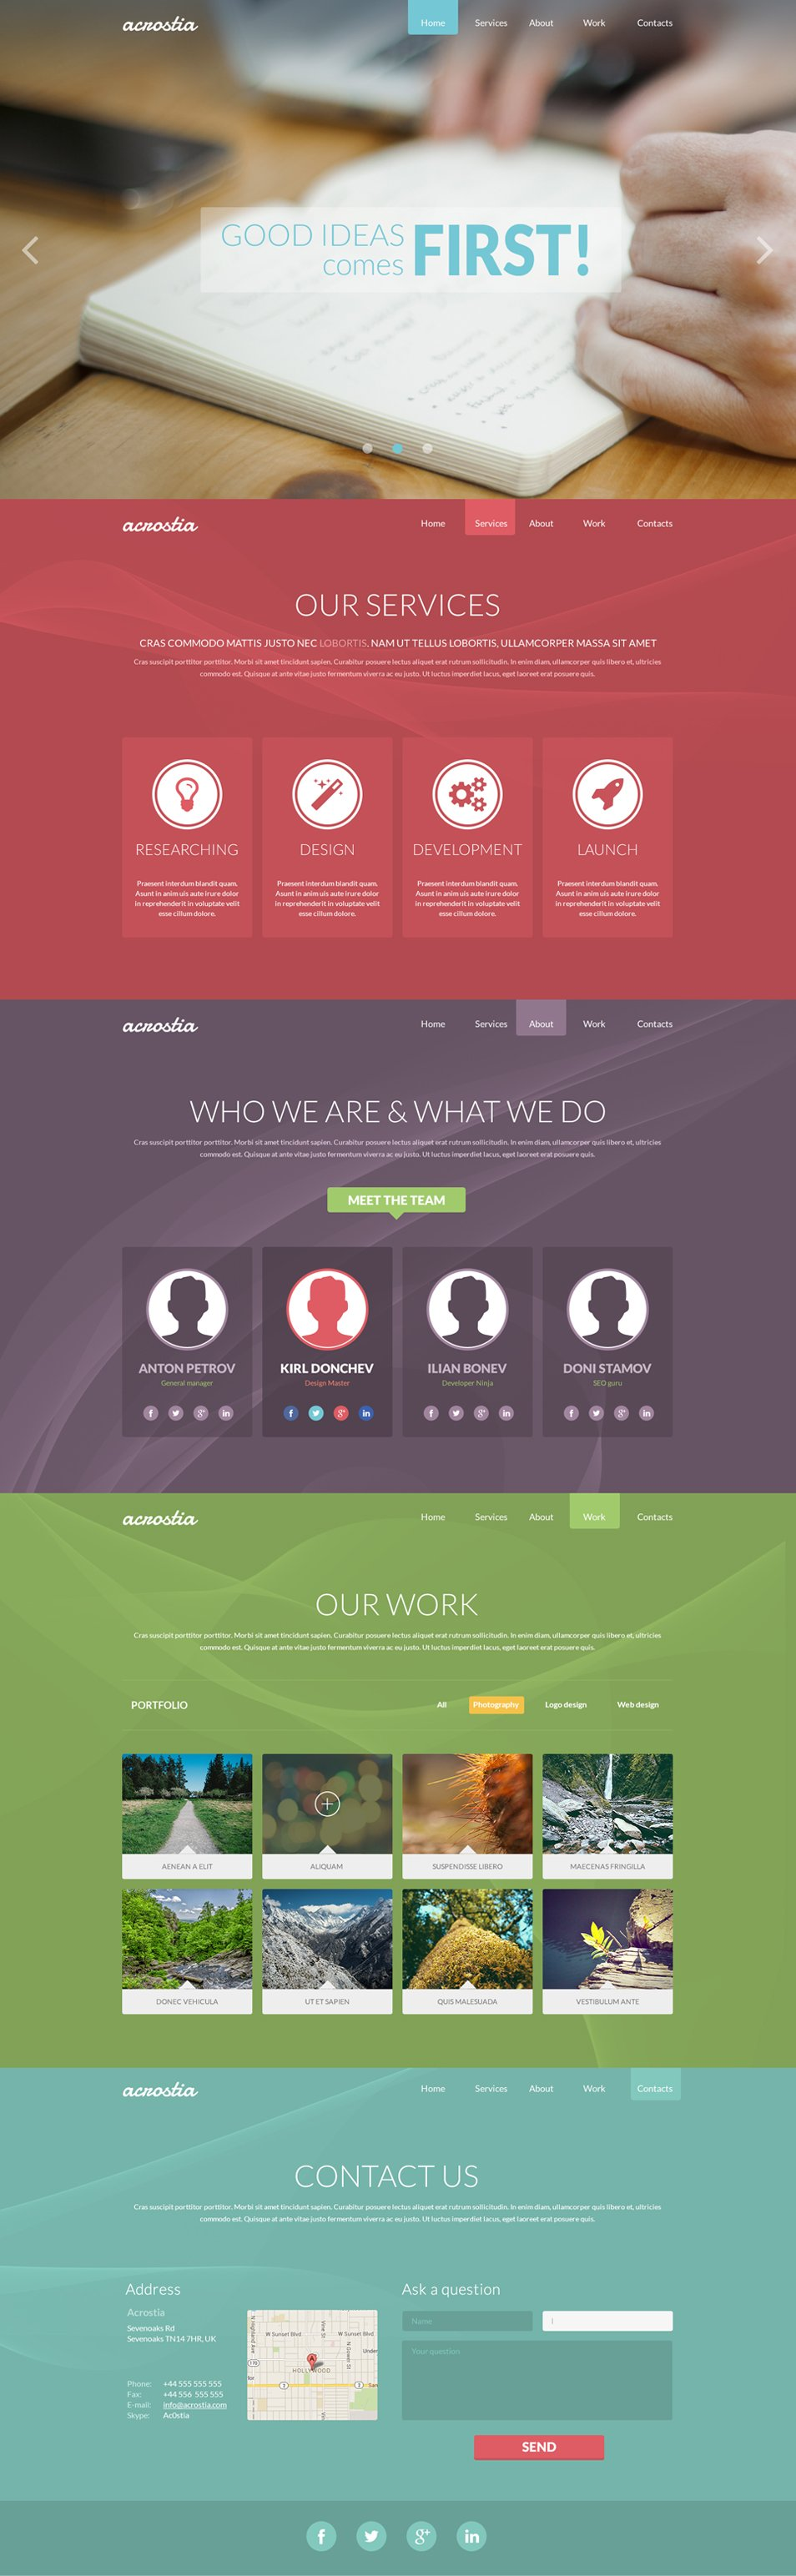 Free Web Templates From 2017 Css Author Web Design Web Development Design Web Layout Design